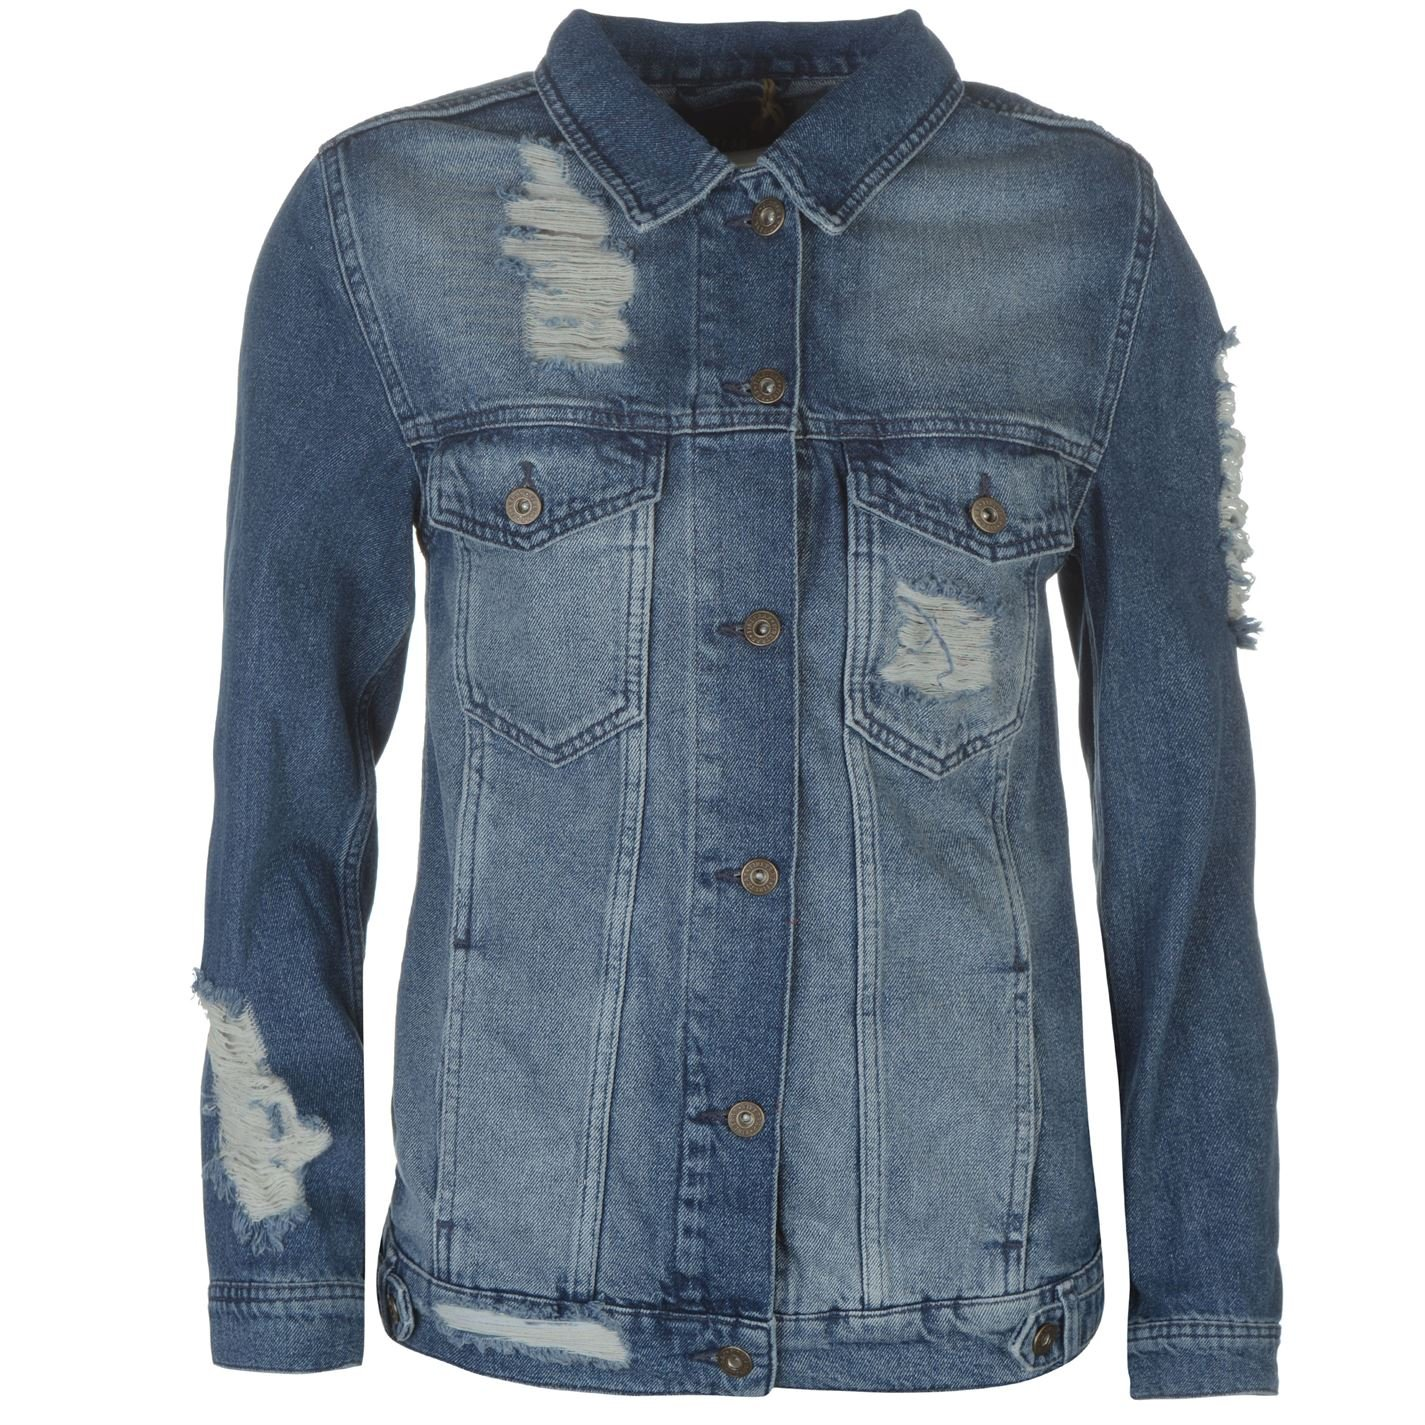 Firetrap Womens Blackseal Distressed Denim Jacket Coat Top Long Sleeve Cotton Blue 10 (S)